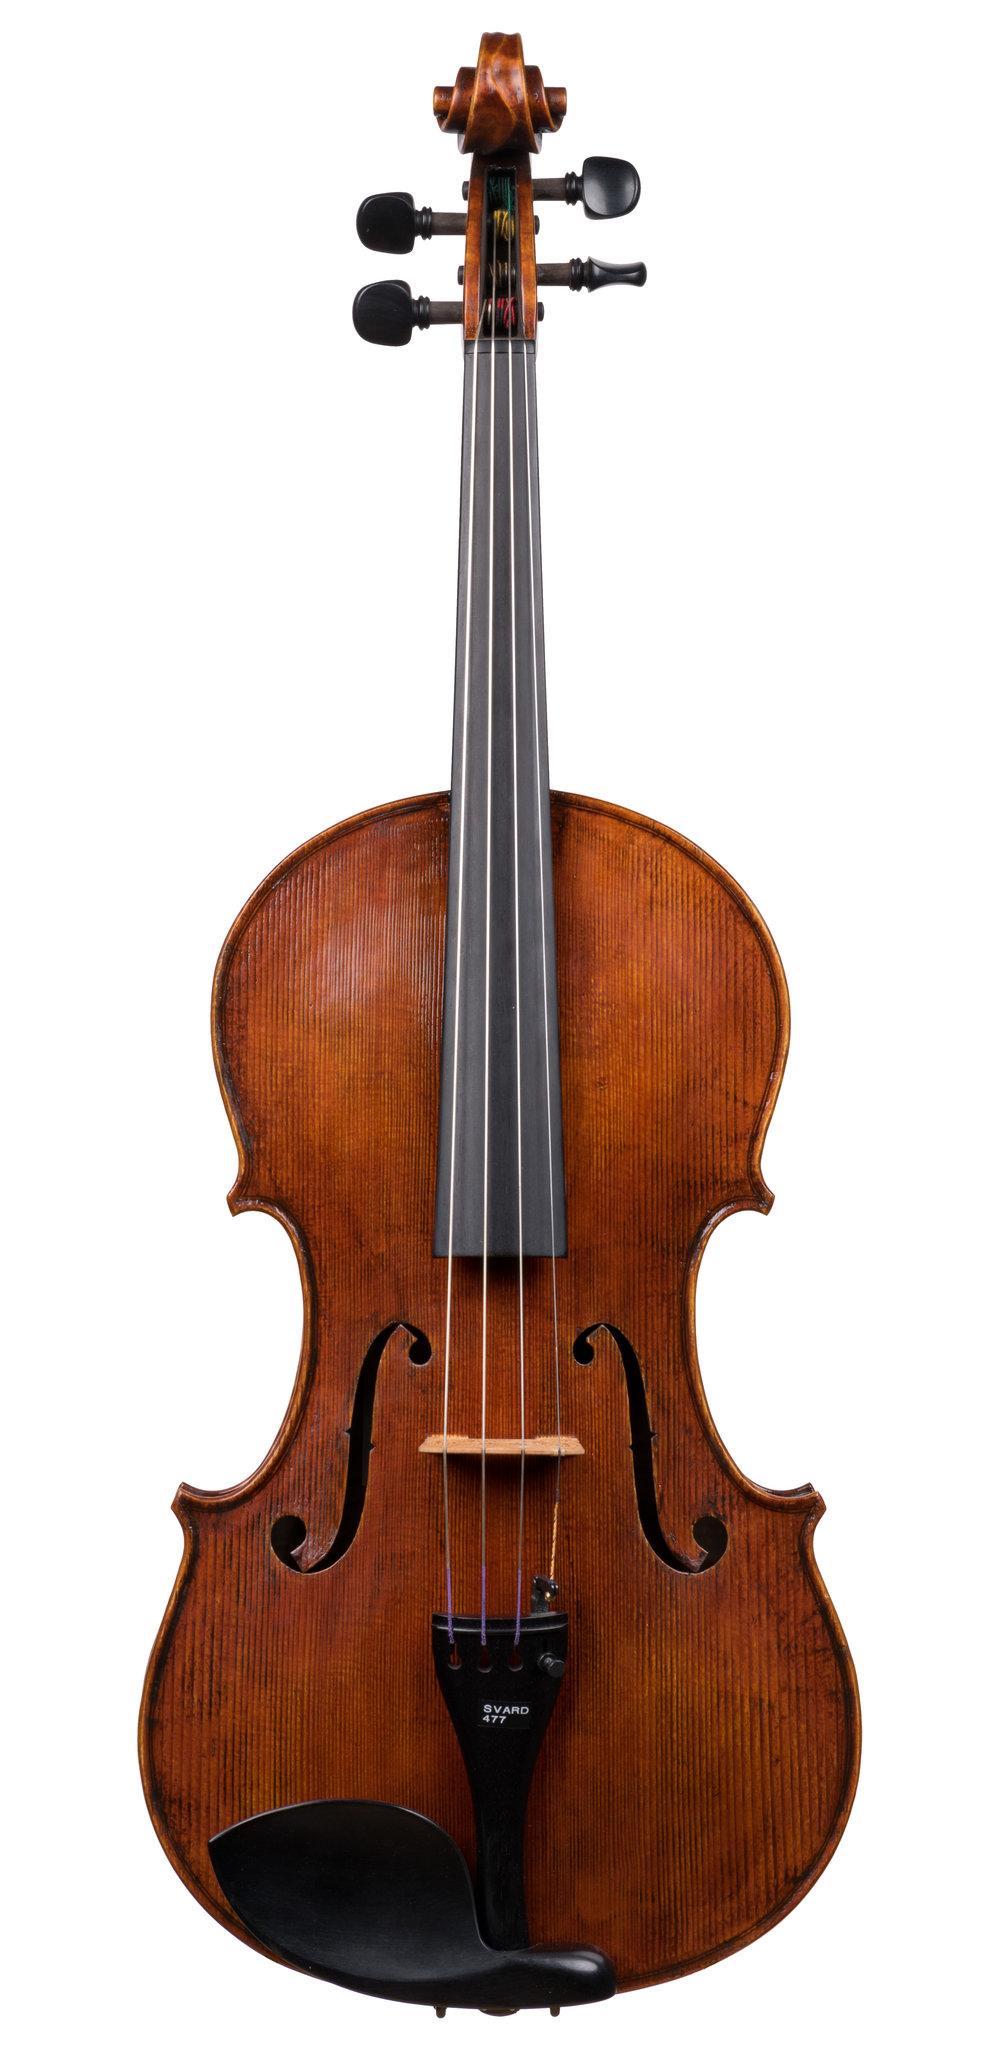 Kristin Siegfried viola, Chicago, 2014, 16